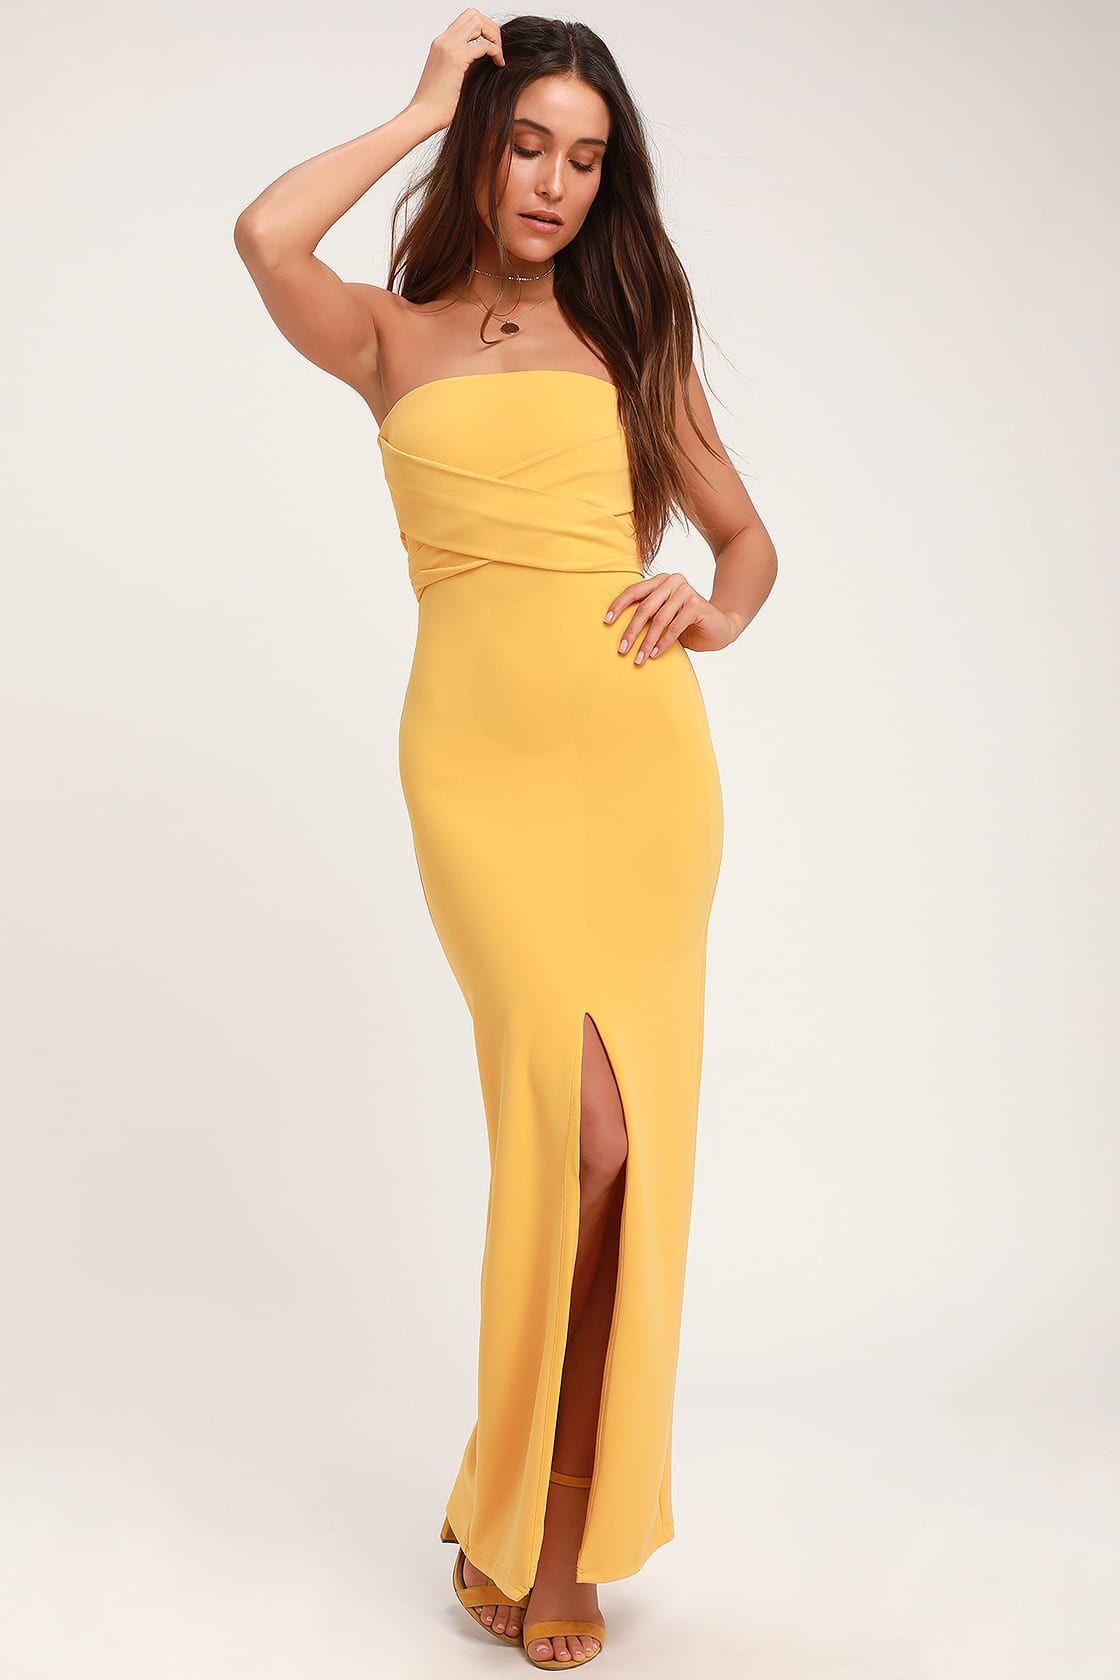 Own The Night Golden Yellow Strapless Maxi Dress Yellow Maxi Dress Cocktail Dress Yellow Womens Yellow Dress [ 1680 x 1120 Pixel ]